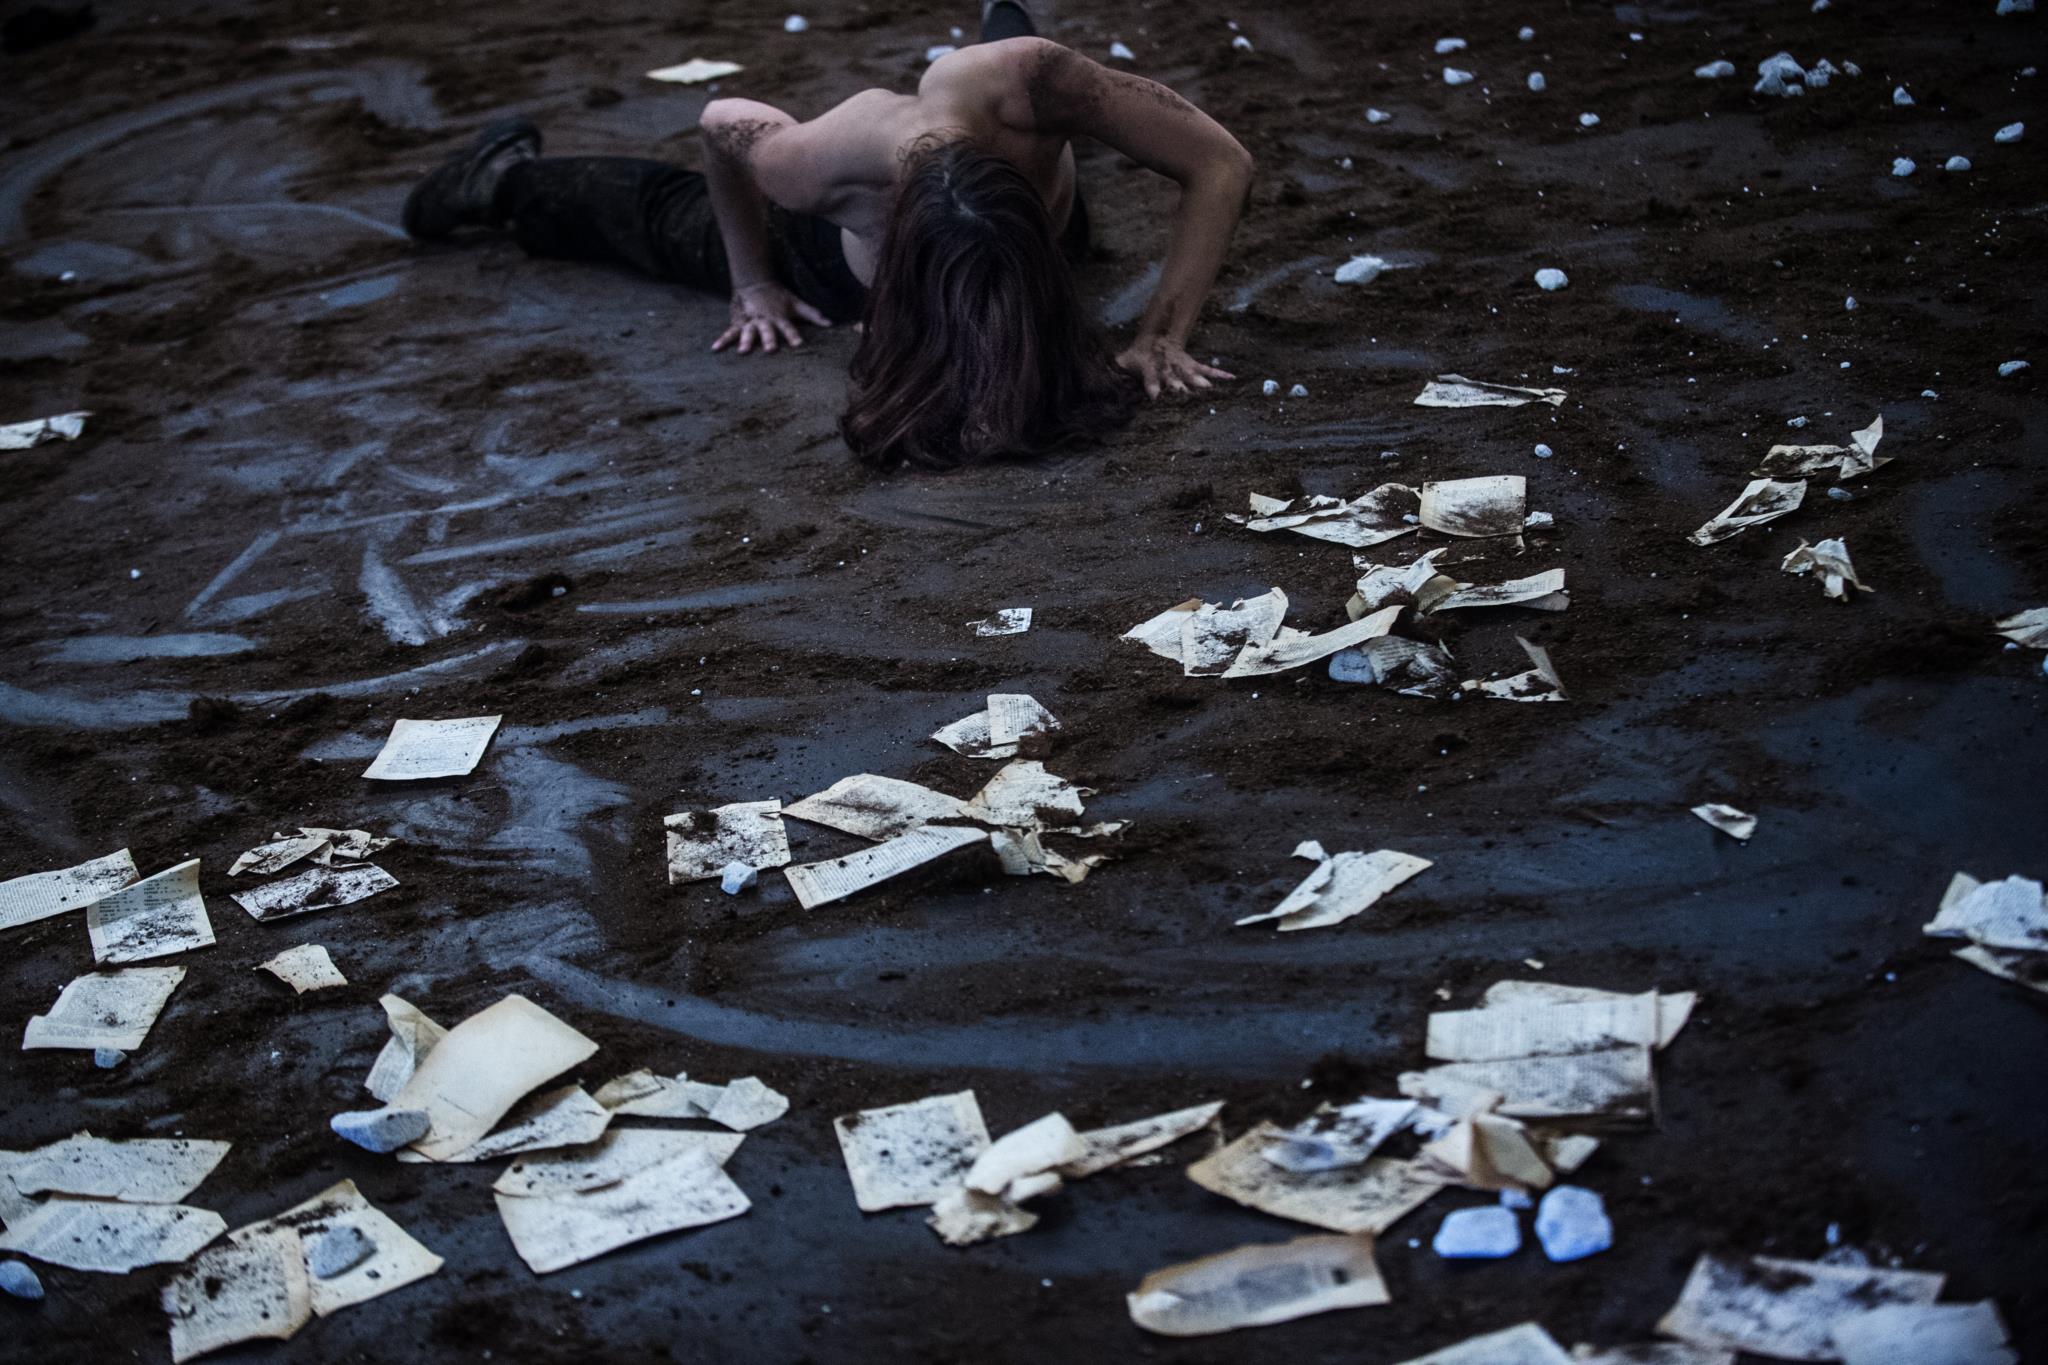 PÚBLICO - Gente perdida por entre a poeira